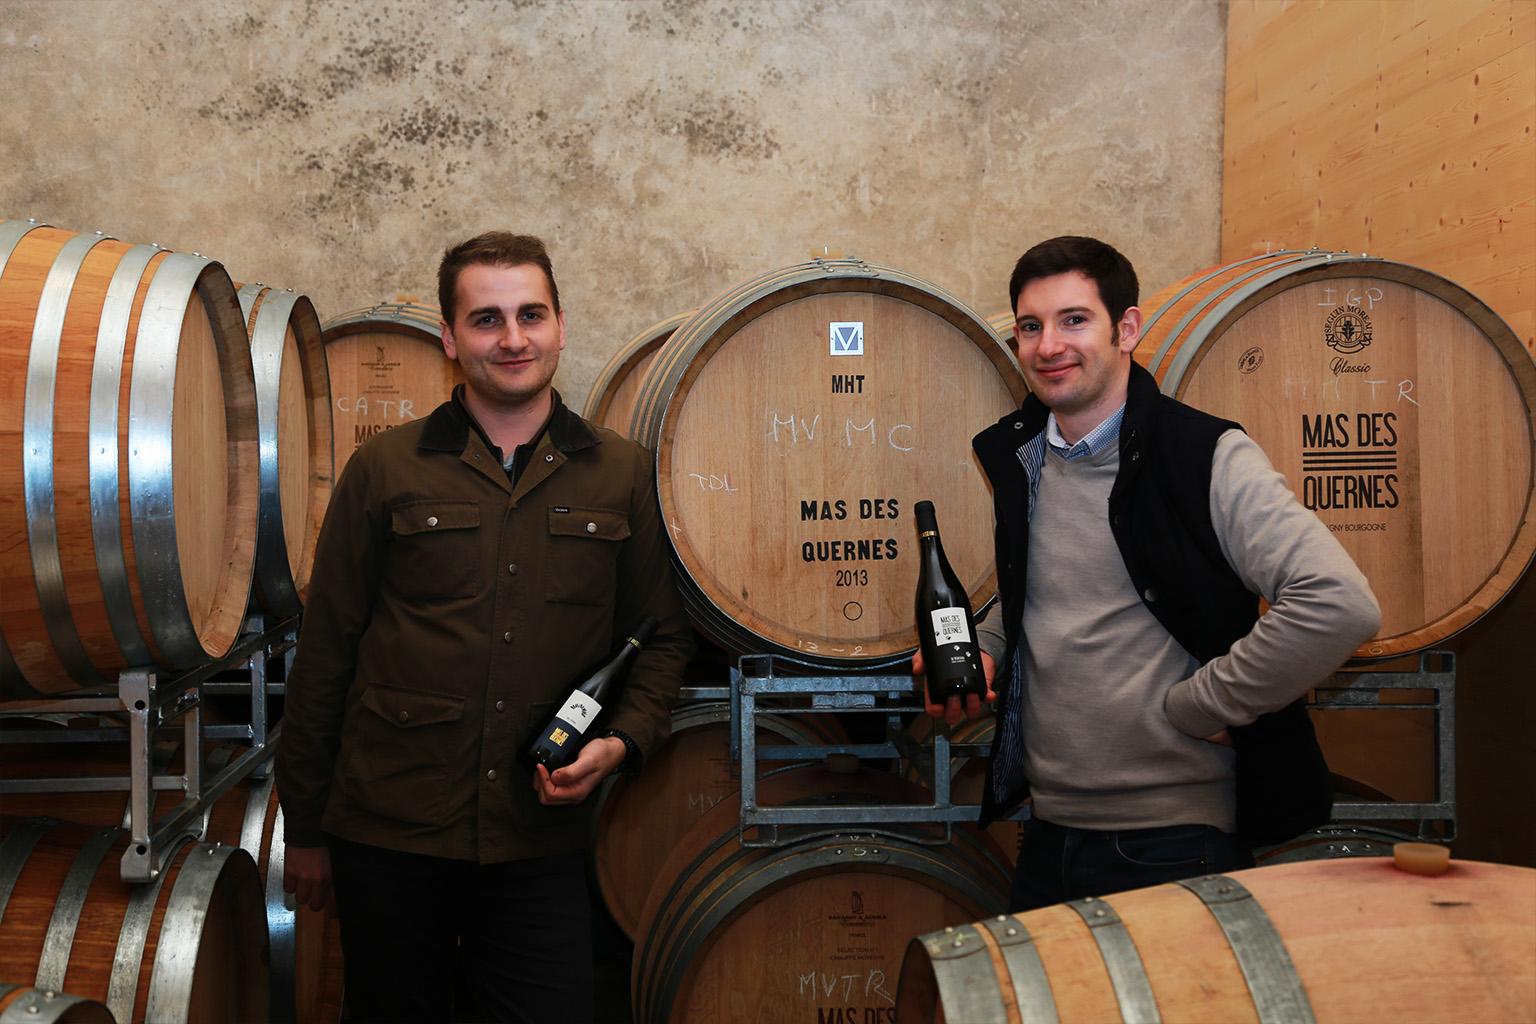 Mas des Quernes - アペロ ワインバー / apéro WINEBAR - vins et petits plats français - Minami Aoyama Tokyo